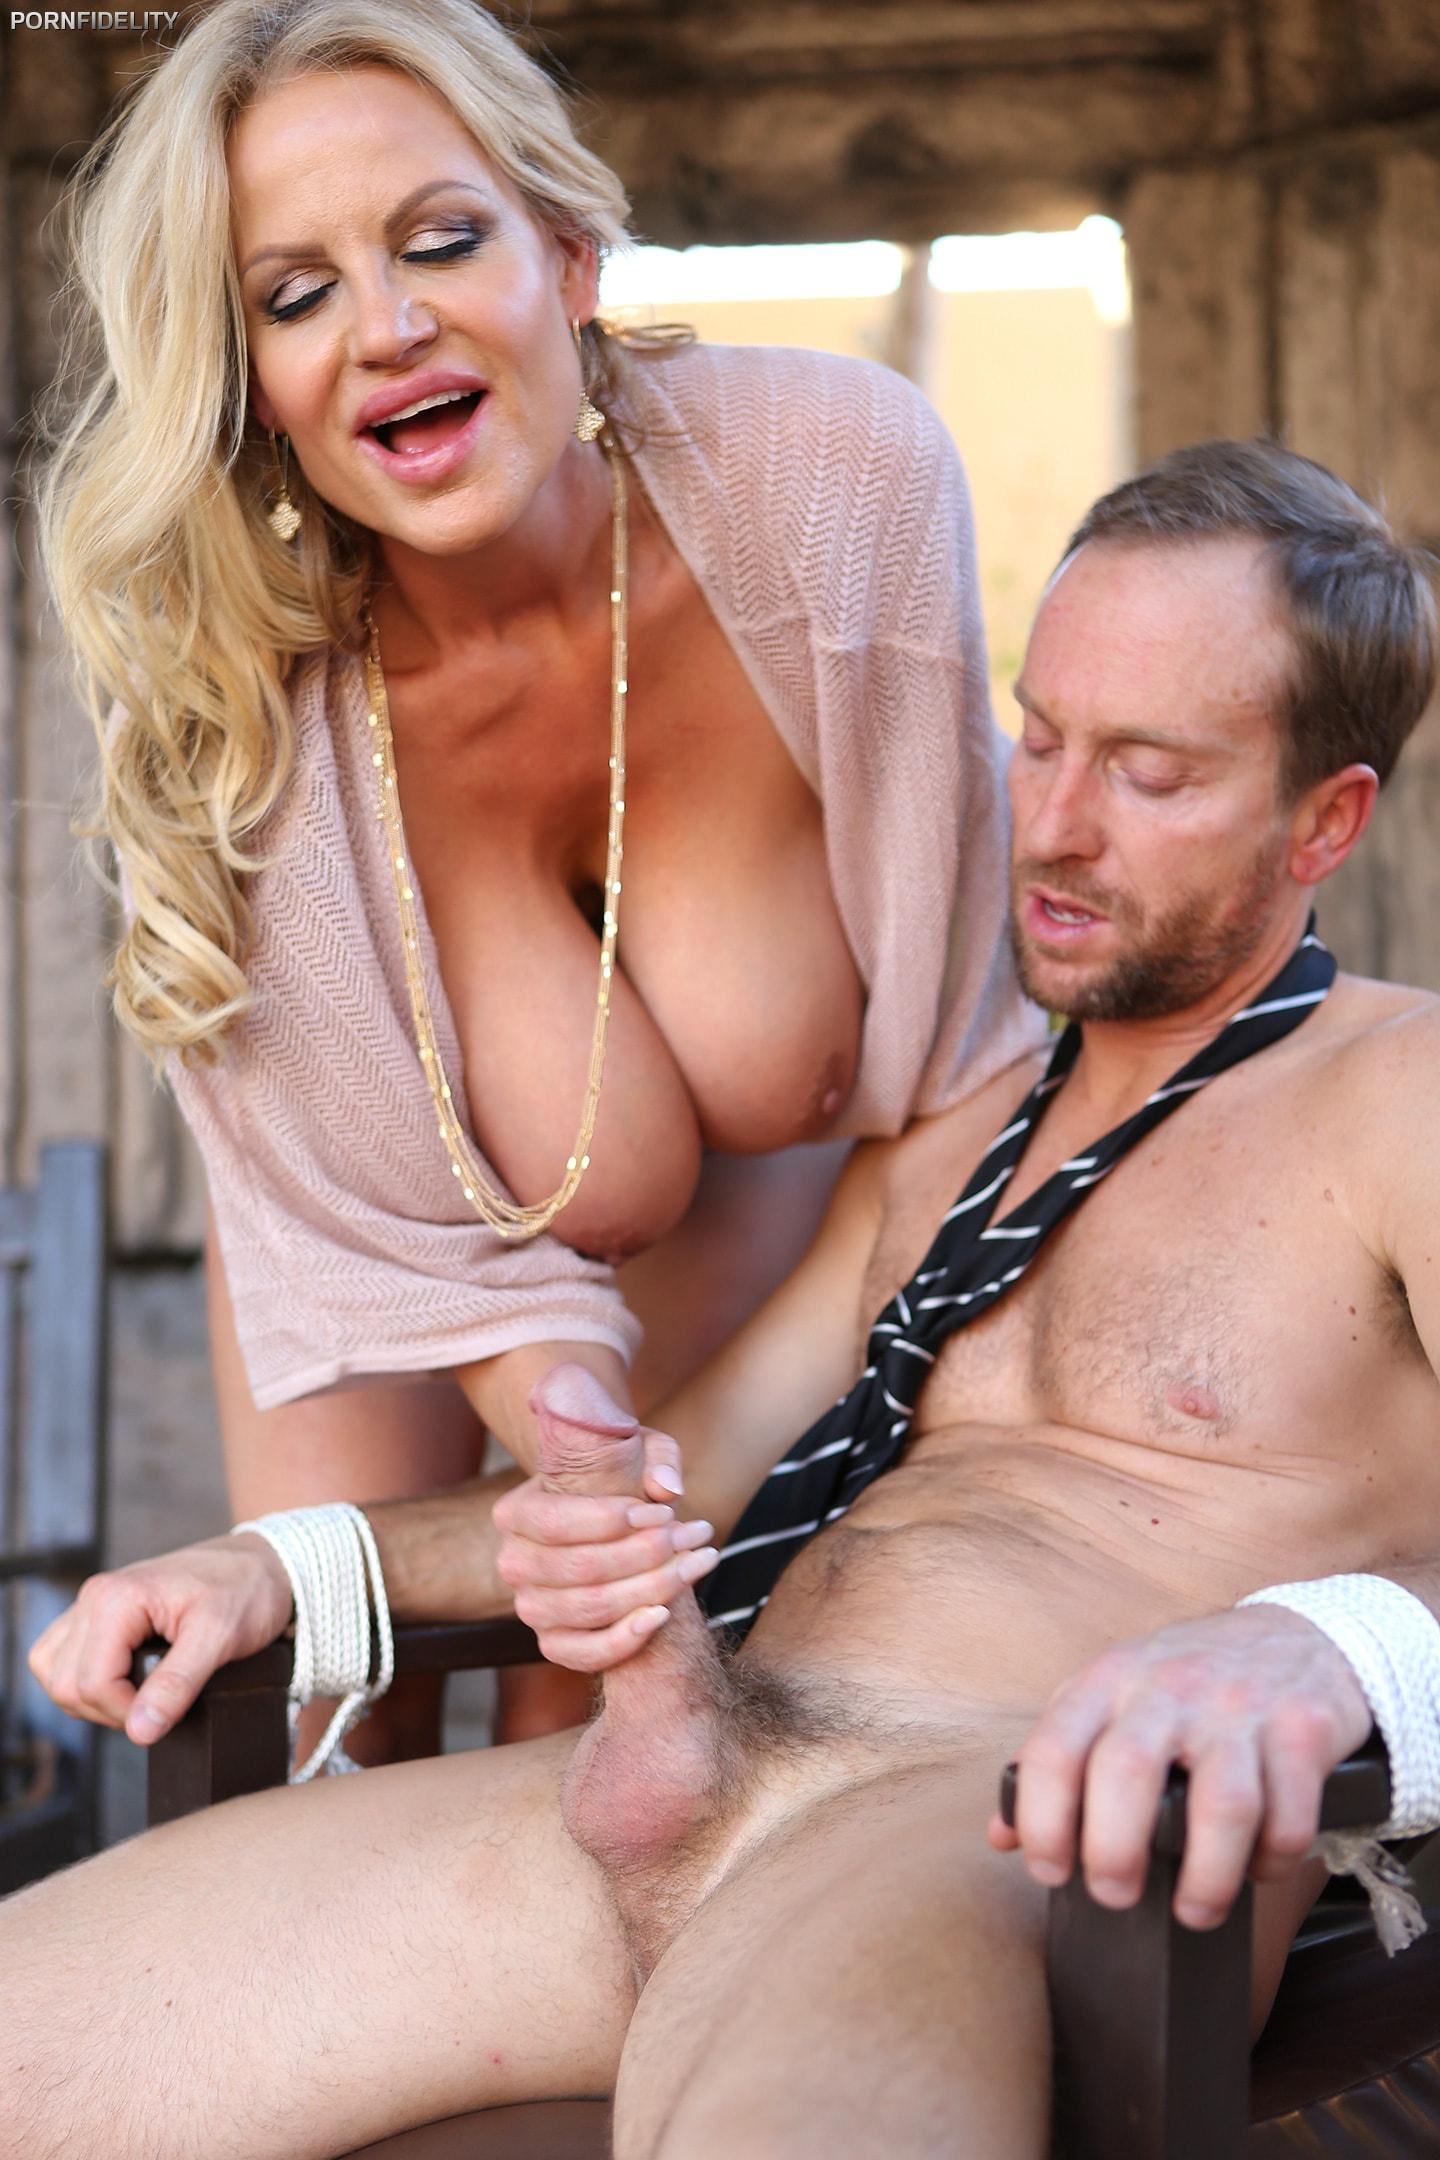 kelly-madison-smotret-porno